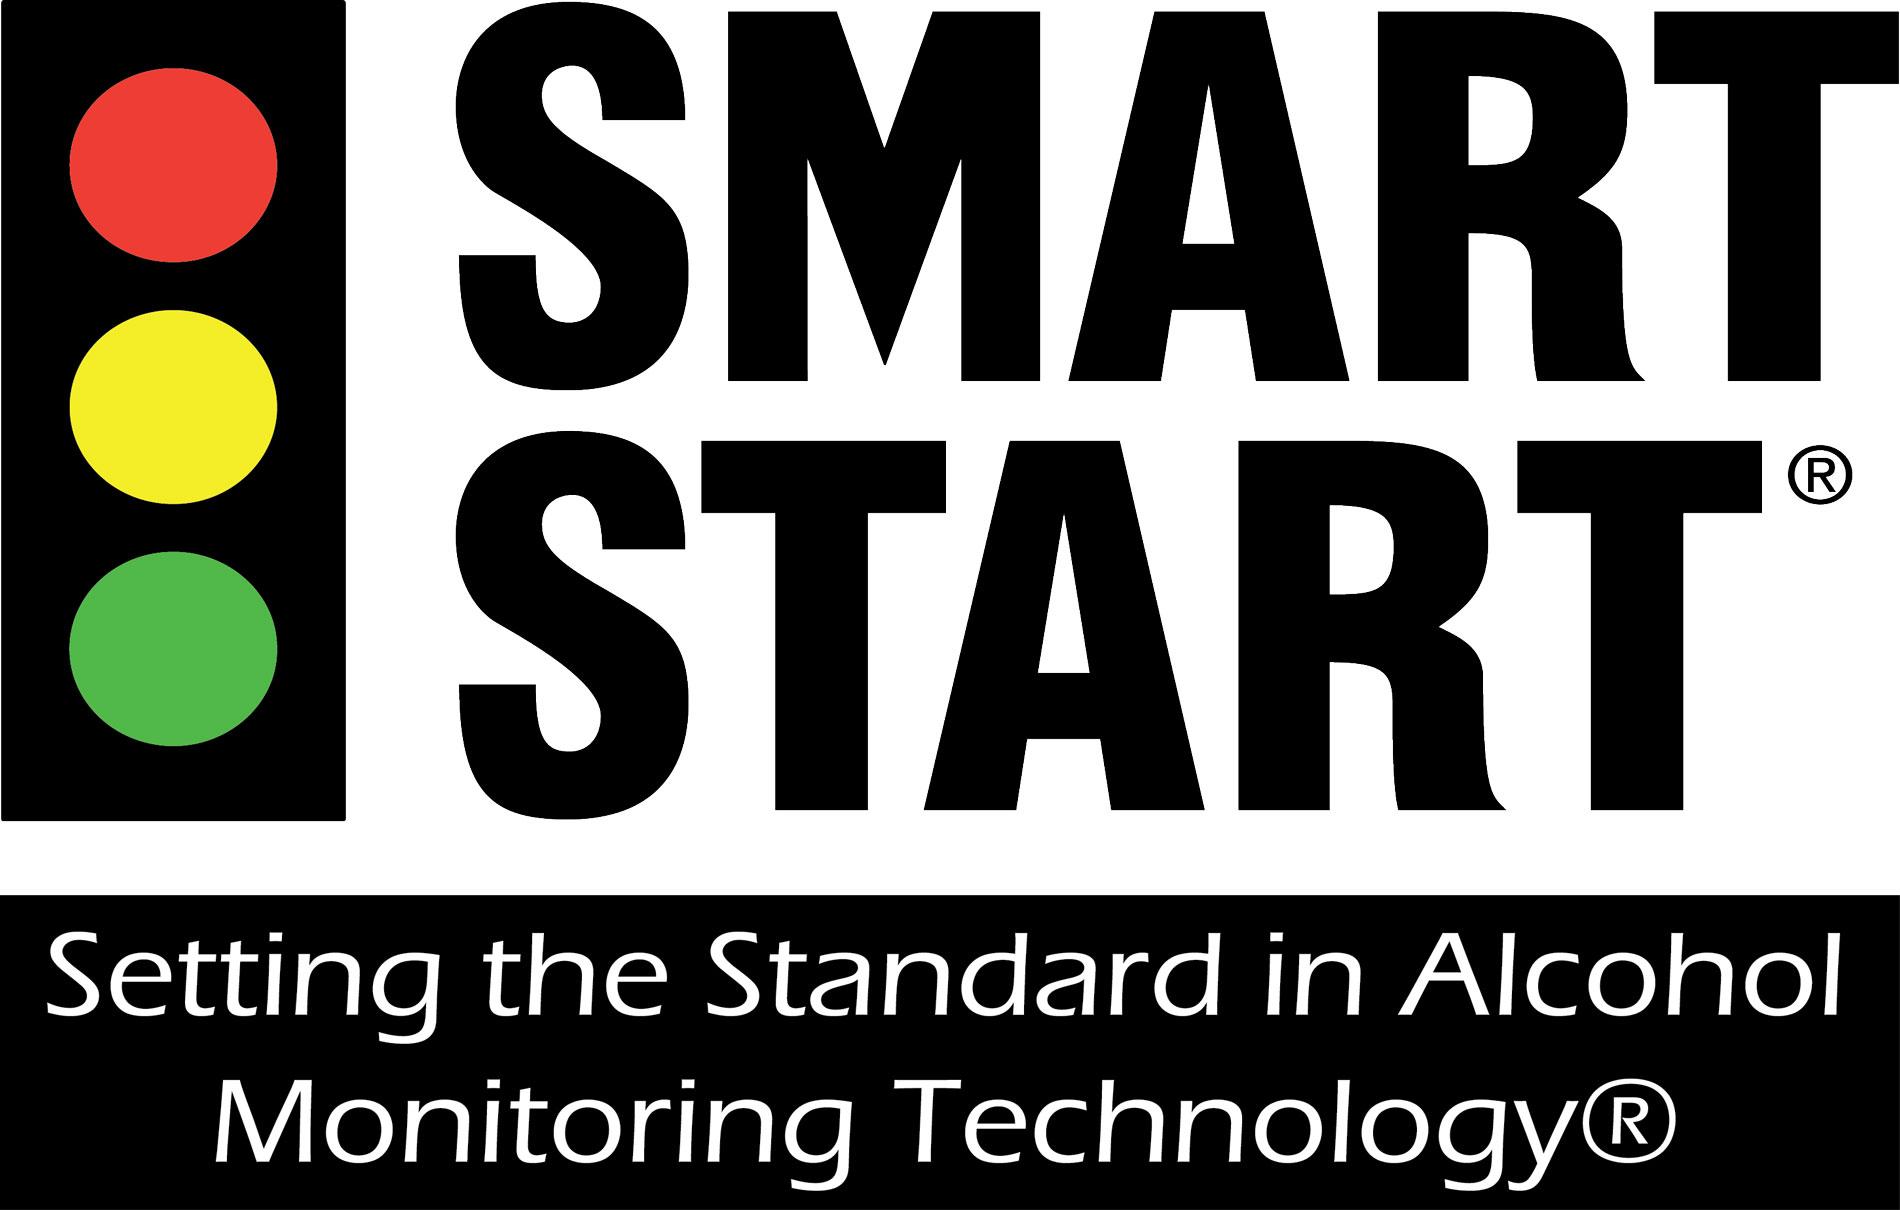 Alcohol Monitoring Technology